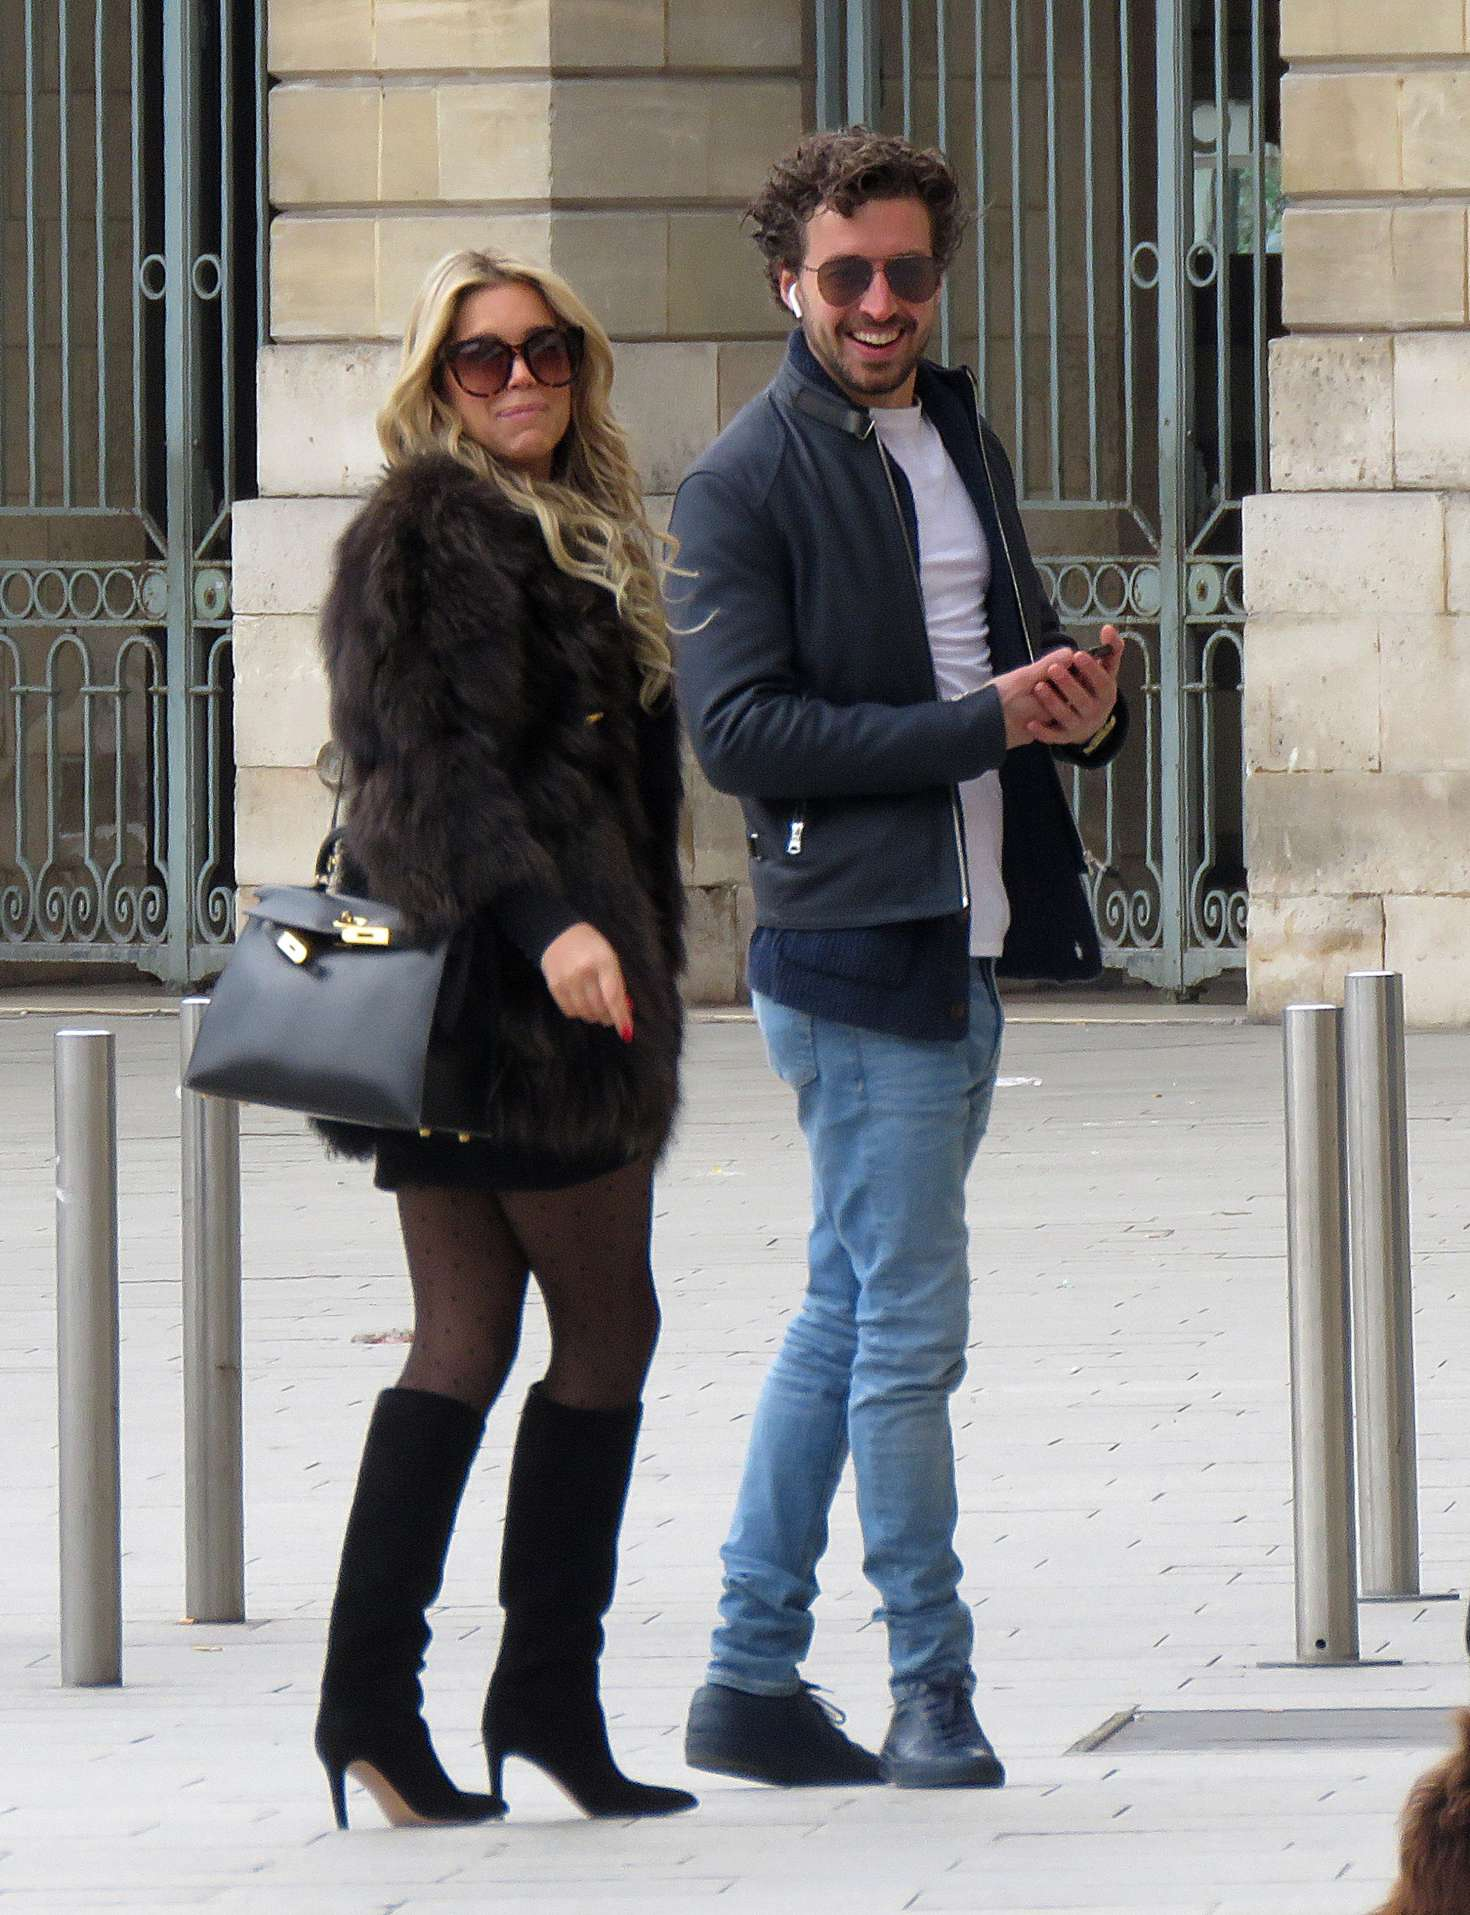 Sylvie Meis and her boyfriend out in Paris